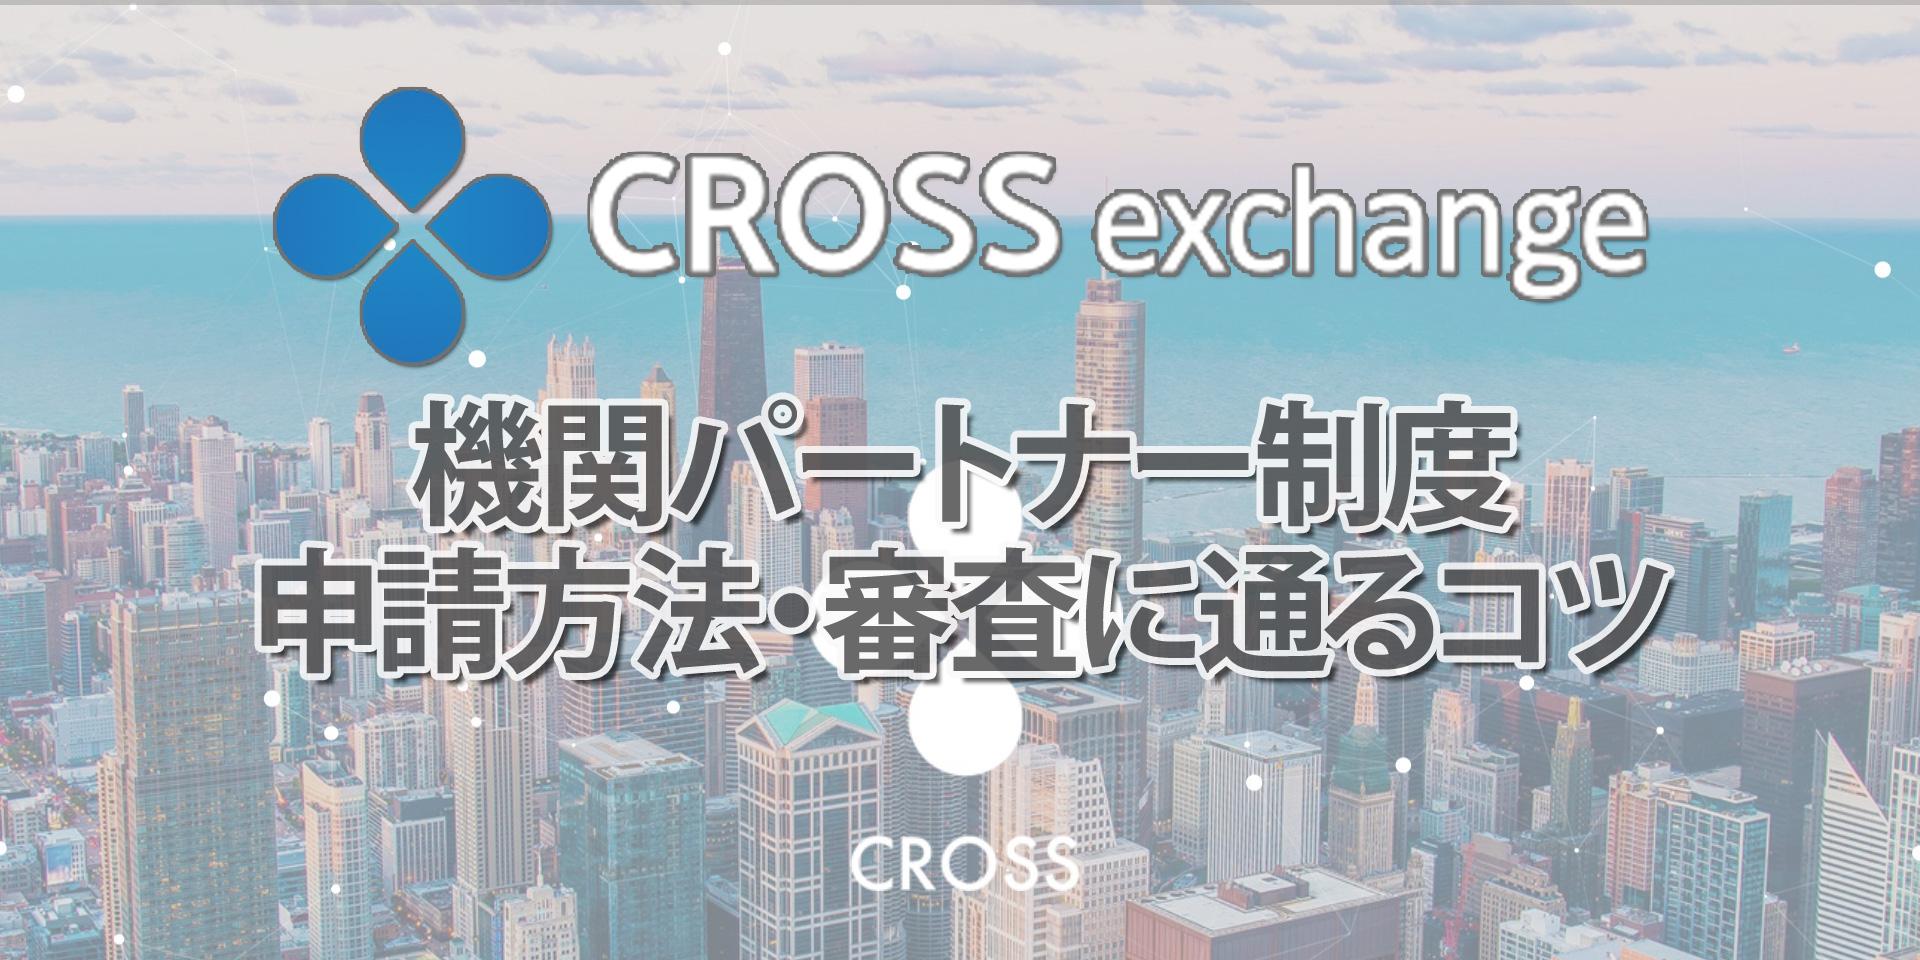 CROSS Exchange(クロスエクスチェンジ)の機関パートナー制度とは?申請方法や審査に通るコツなどを紹介!